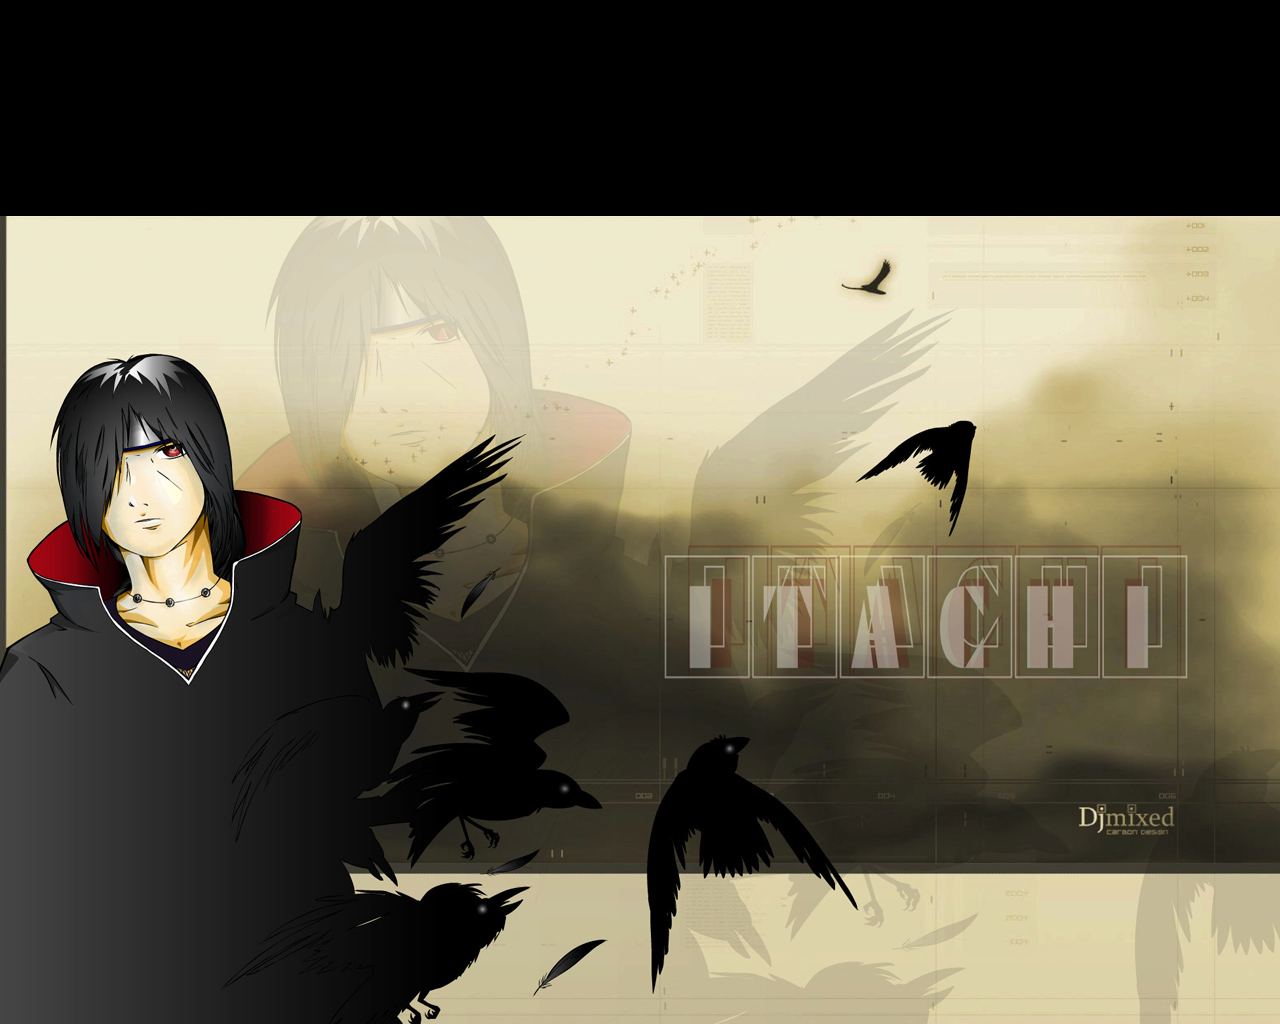 http://2.bp.blogspot.com/__VmPQzv483c/TQxrYE2yjzI/AAAAAAAABDY/isYq4UuDNY0/s1600/Uchiha_Itachi_Genjutsu_Wallpaper-968837.jpeg